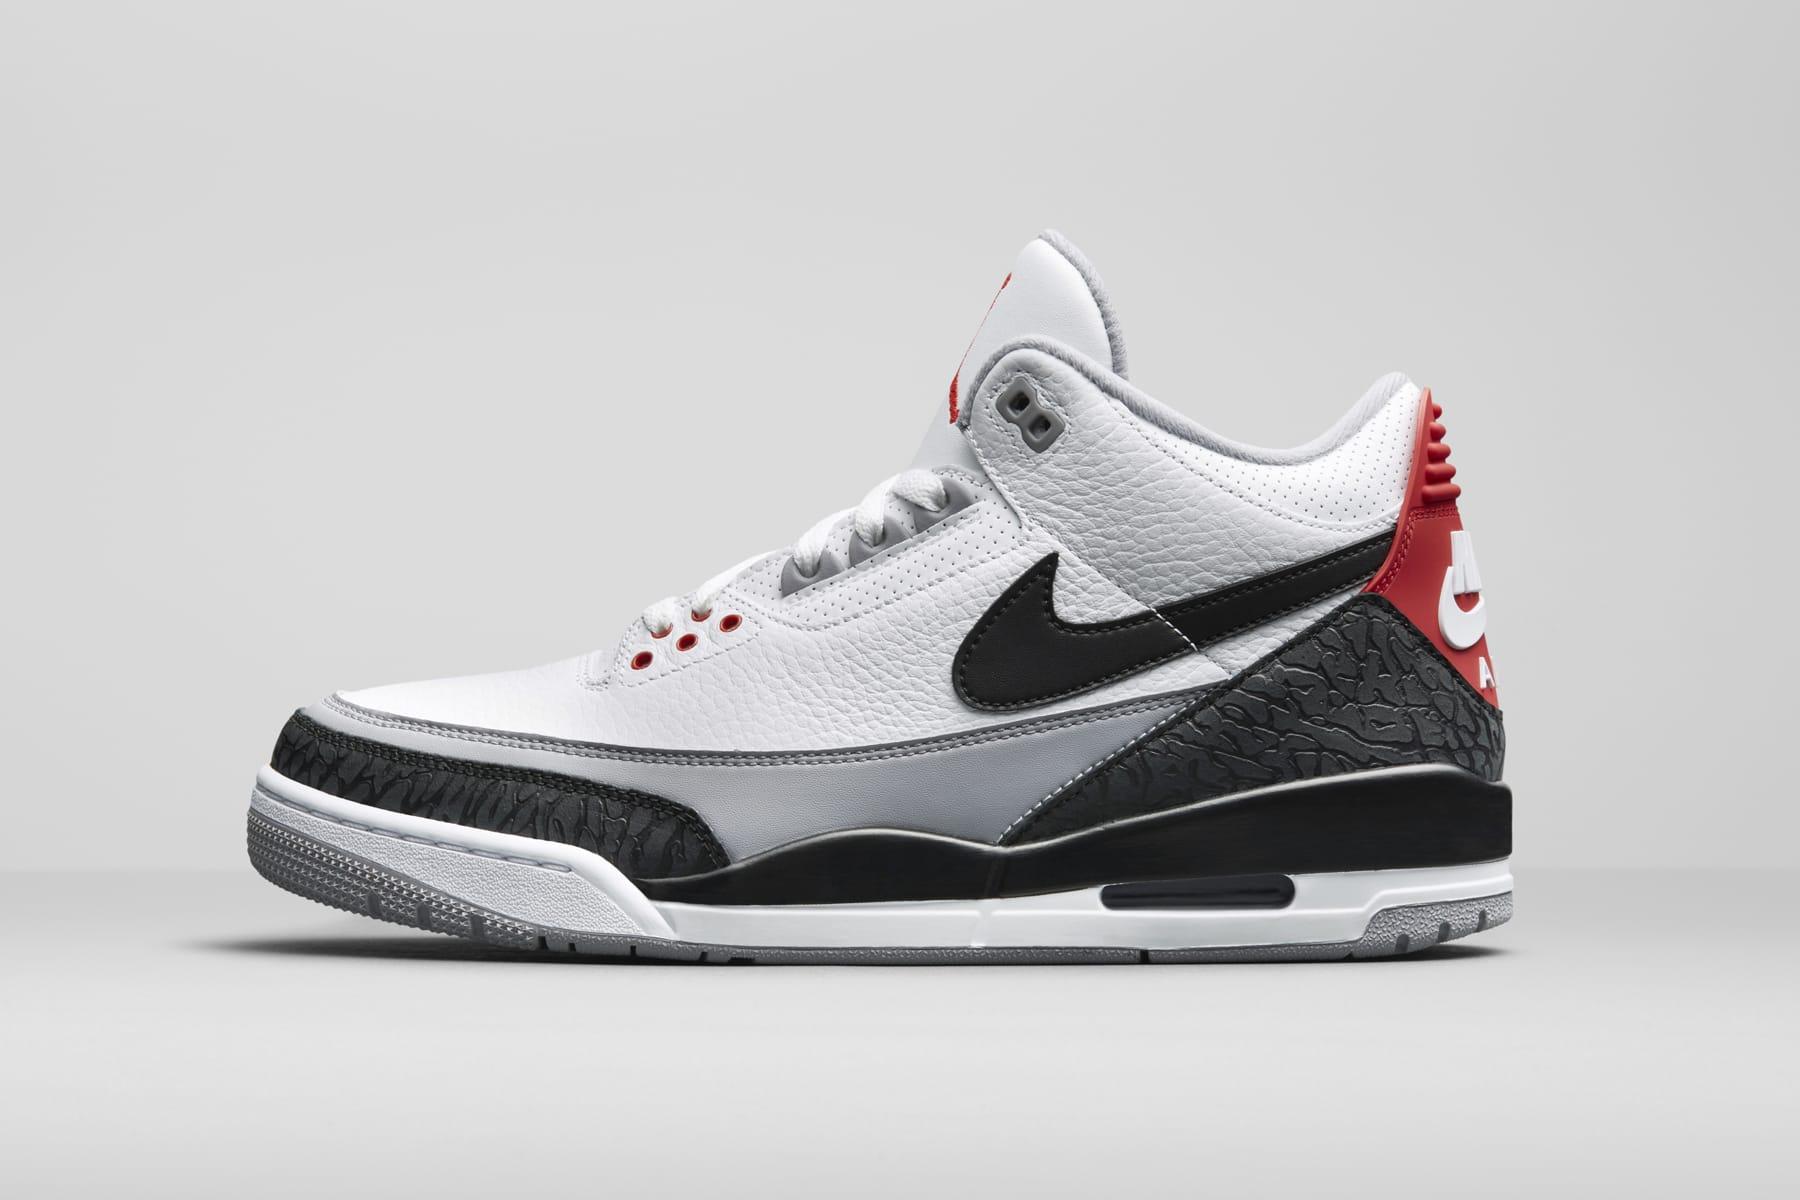 3e9cd025de0 Nike Air Jordan 3 White